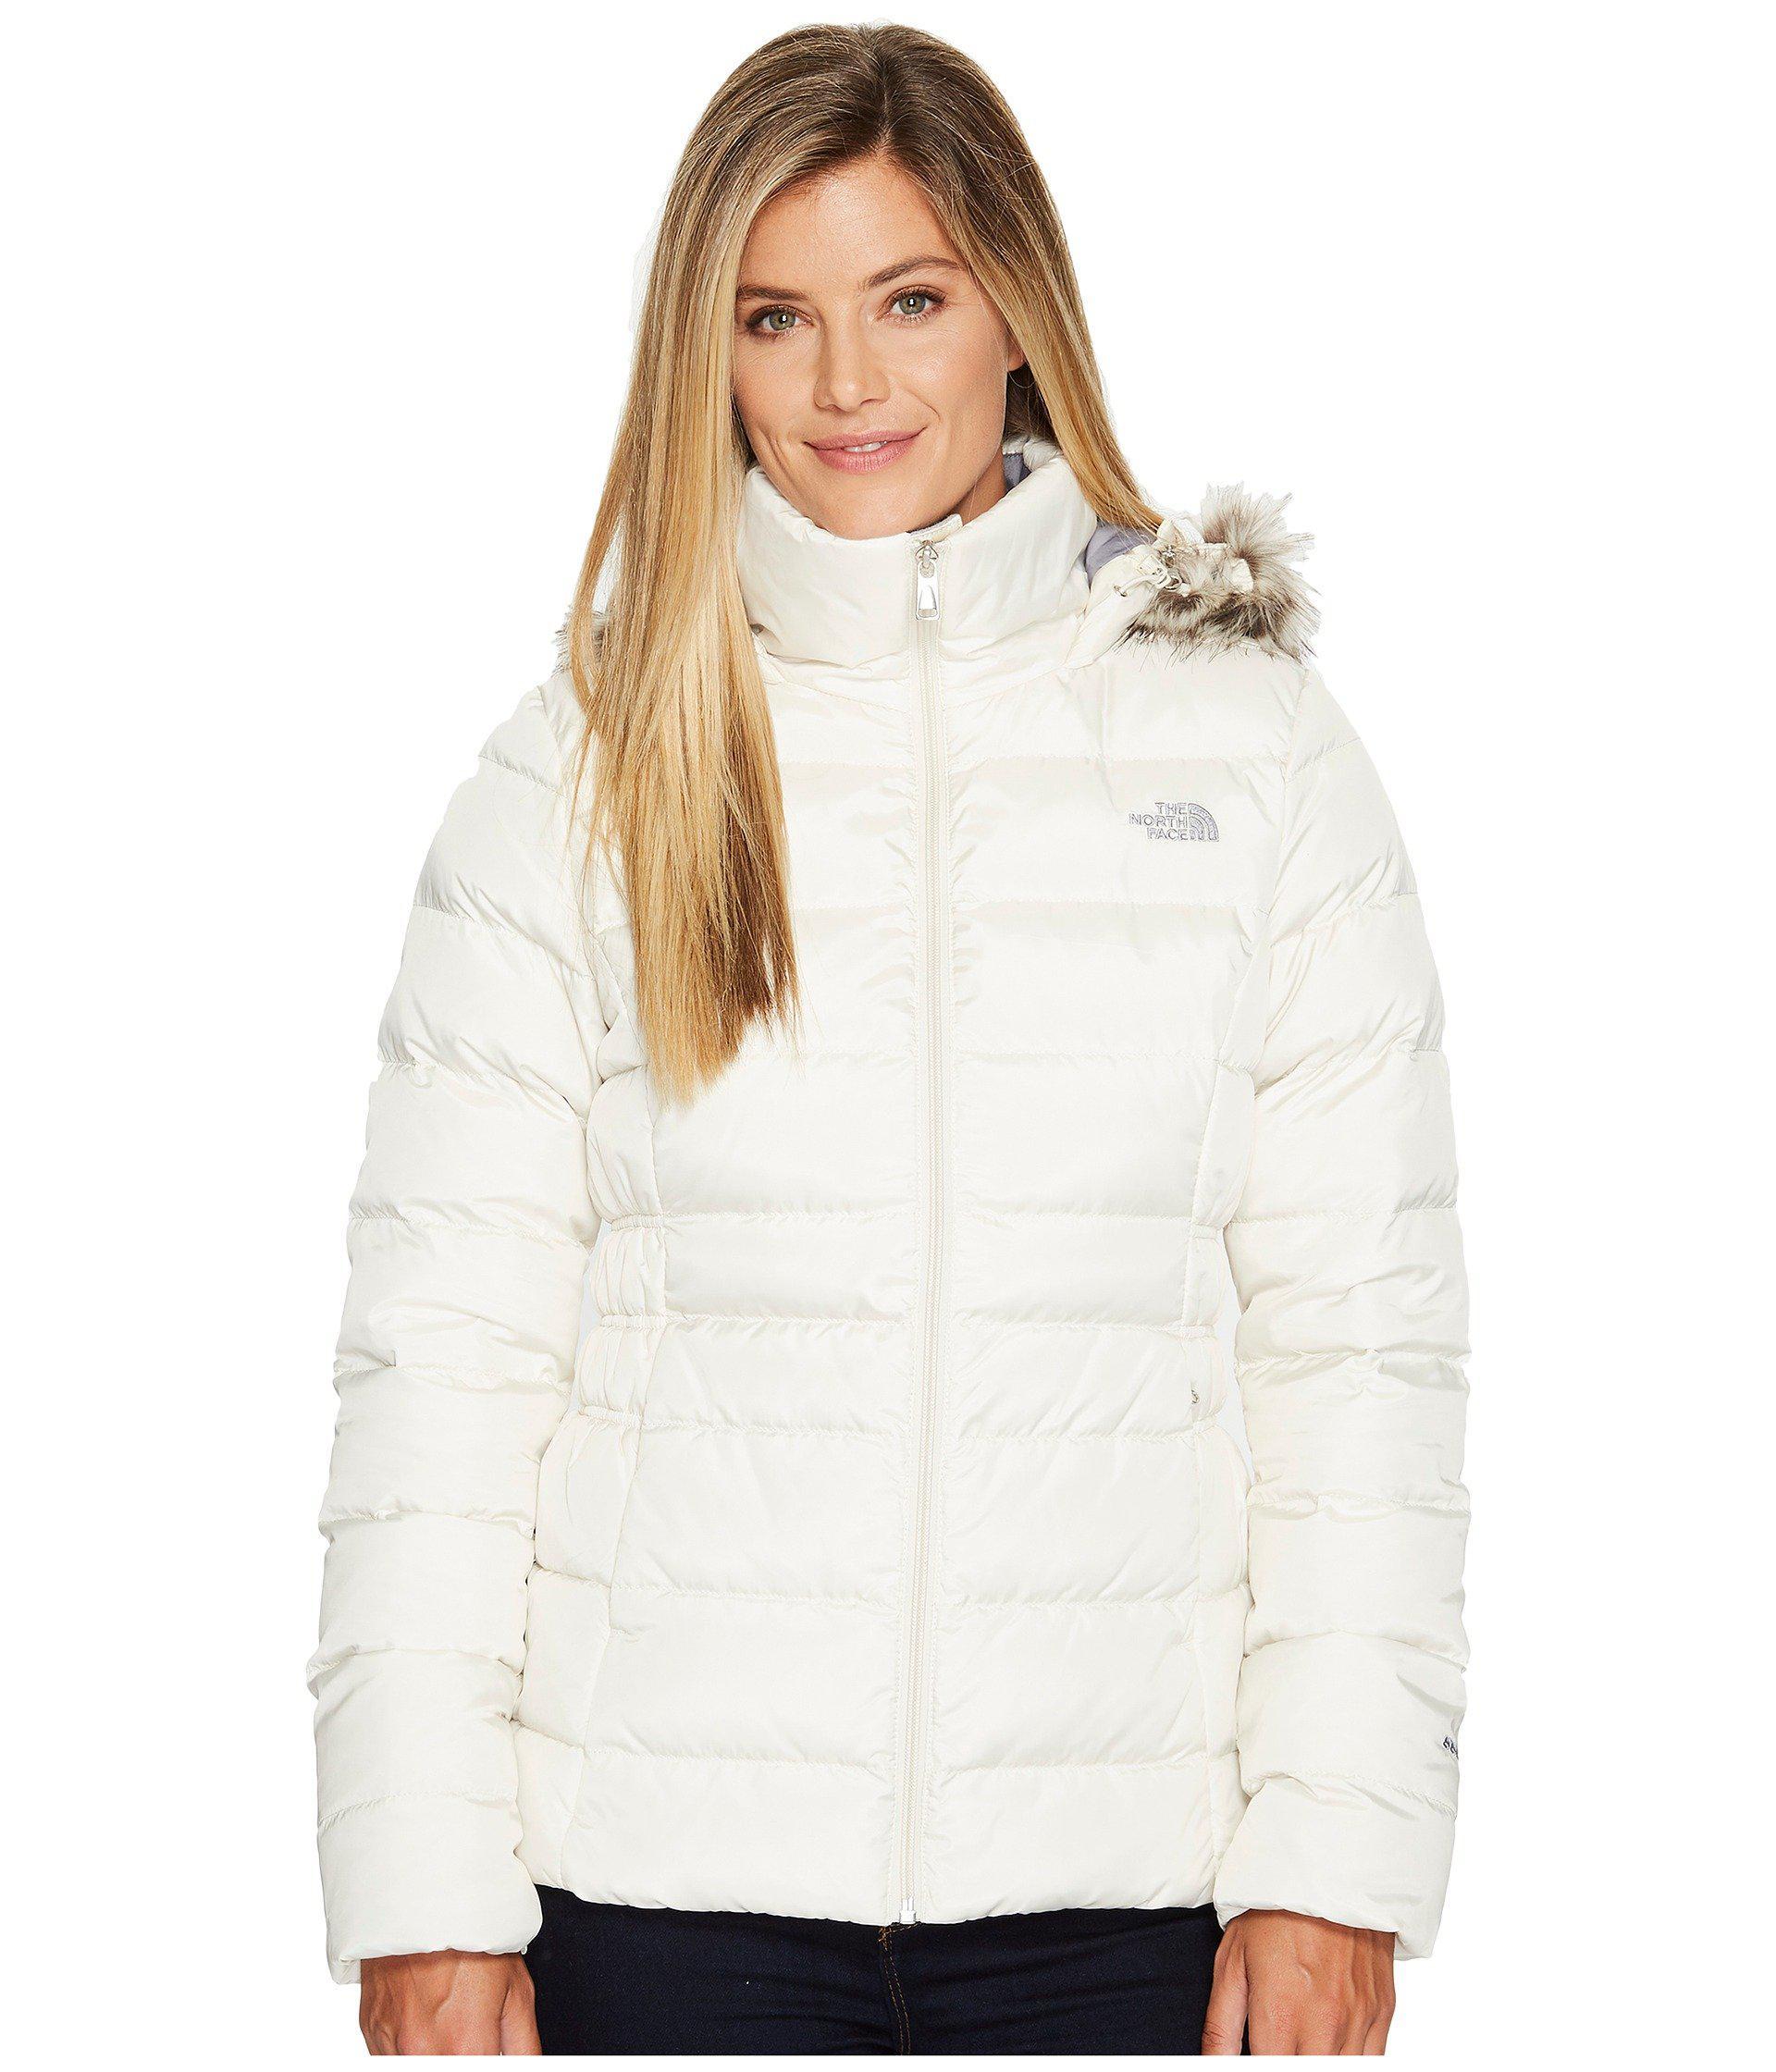 385e6cde7 White Gotham Jacket Ii (tnf Black) Women's Coat